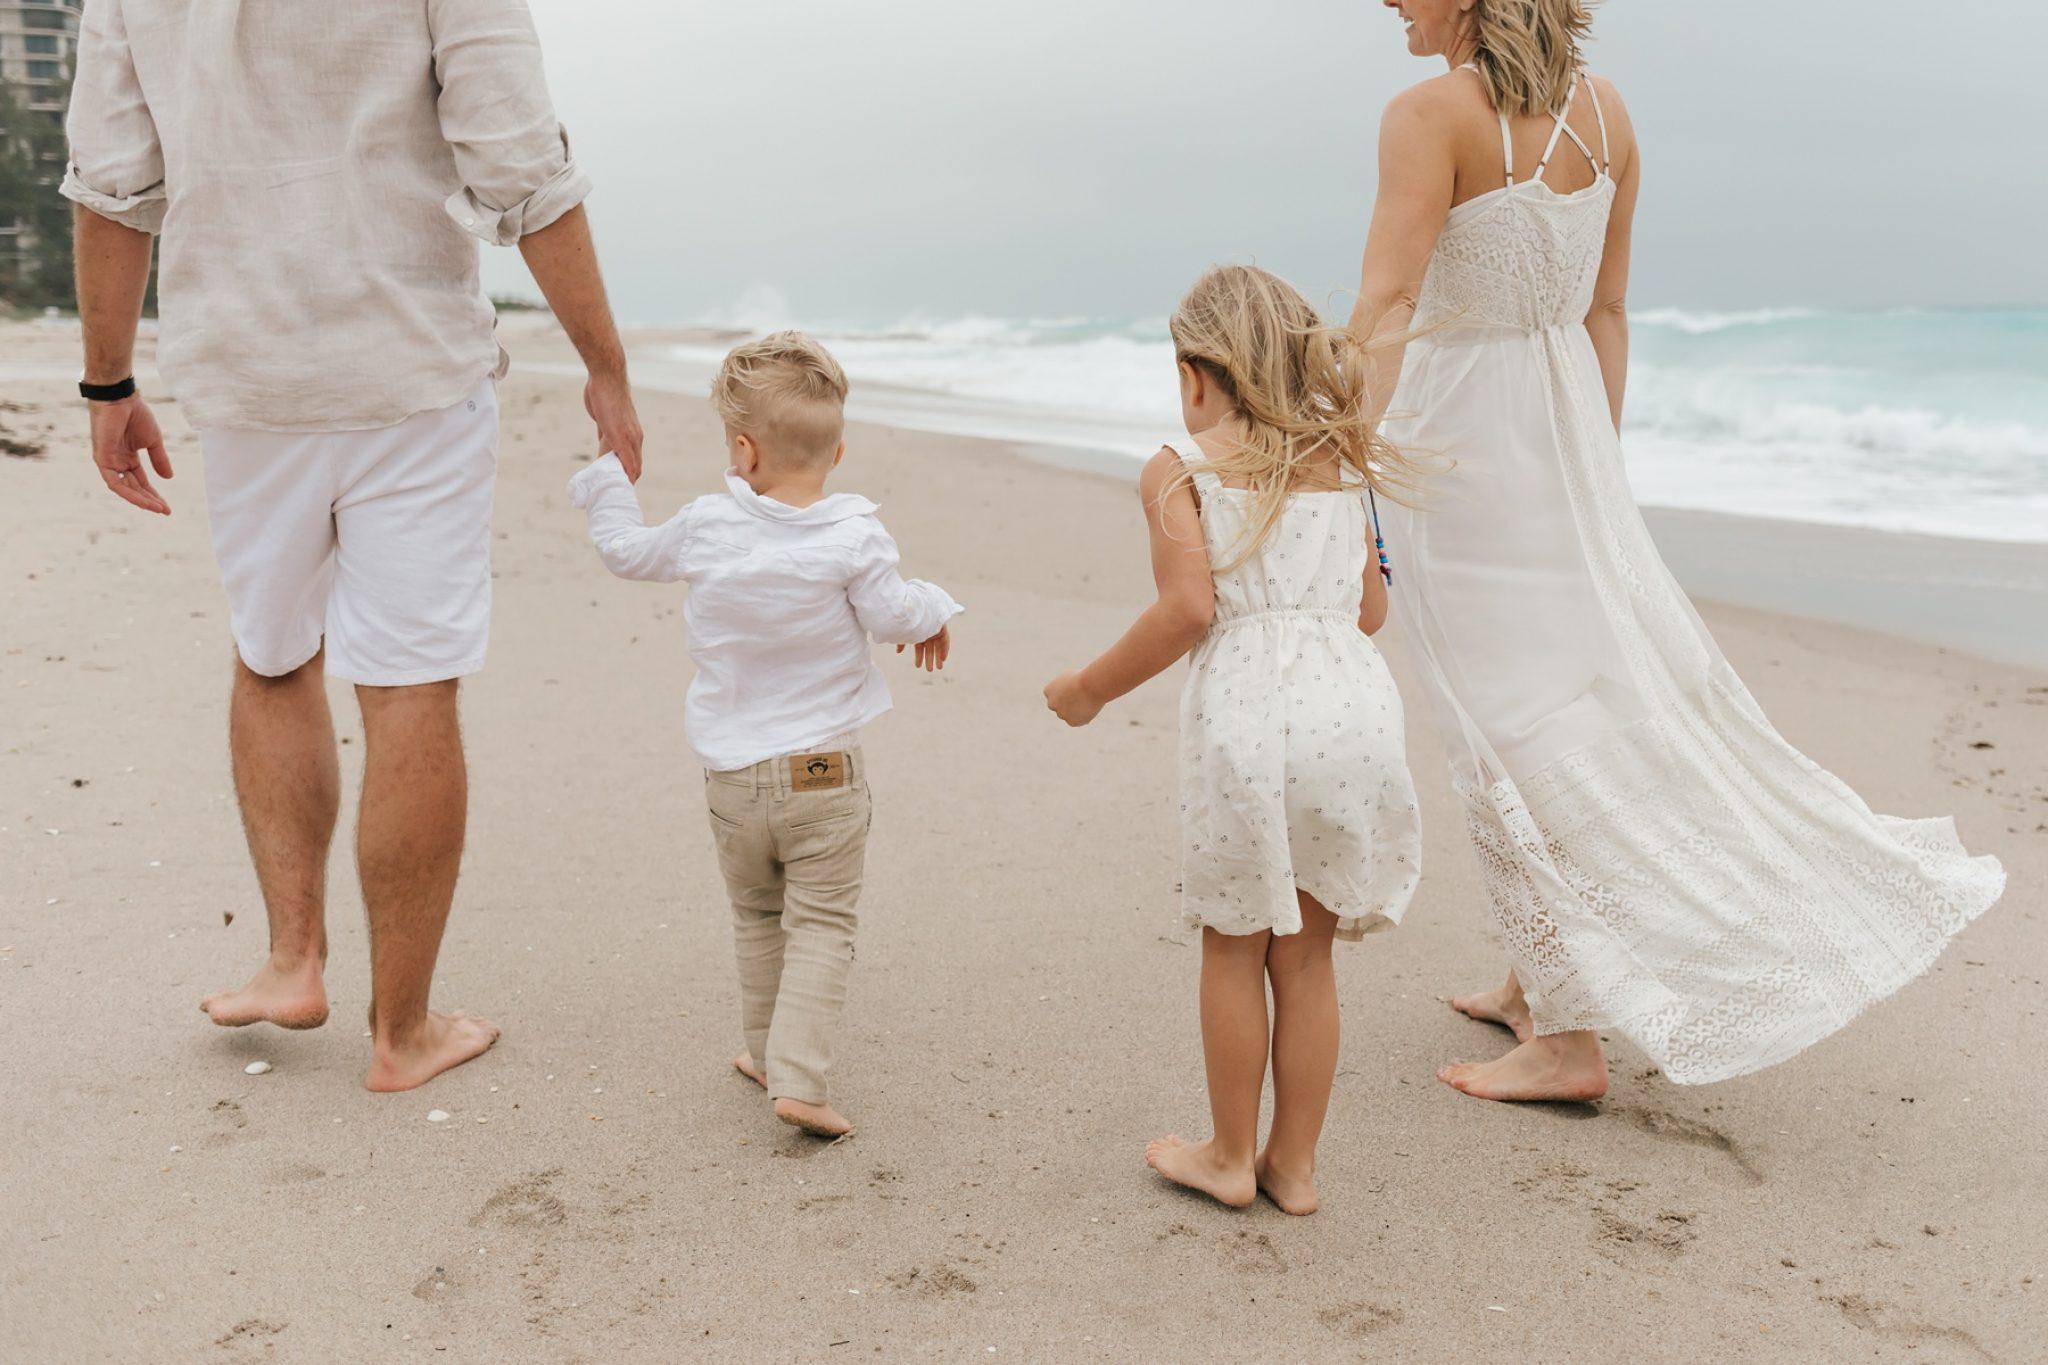 Palm-Beach-Marriott-Singer-Island-Beach-Resort-Family-Photography-Erica-Brooke-Photography-20